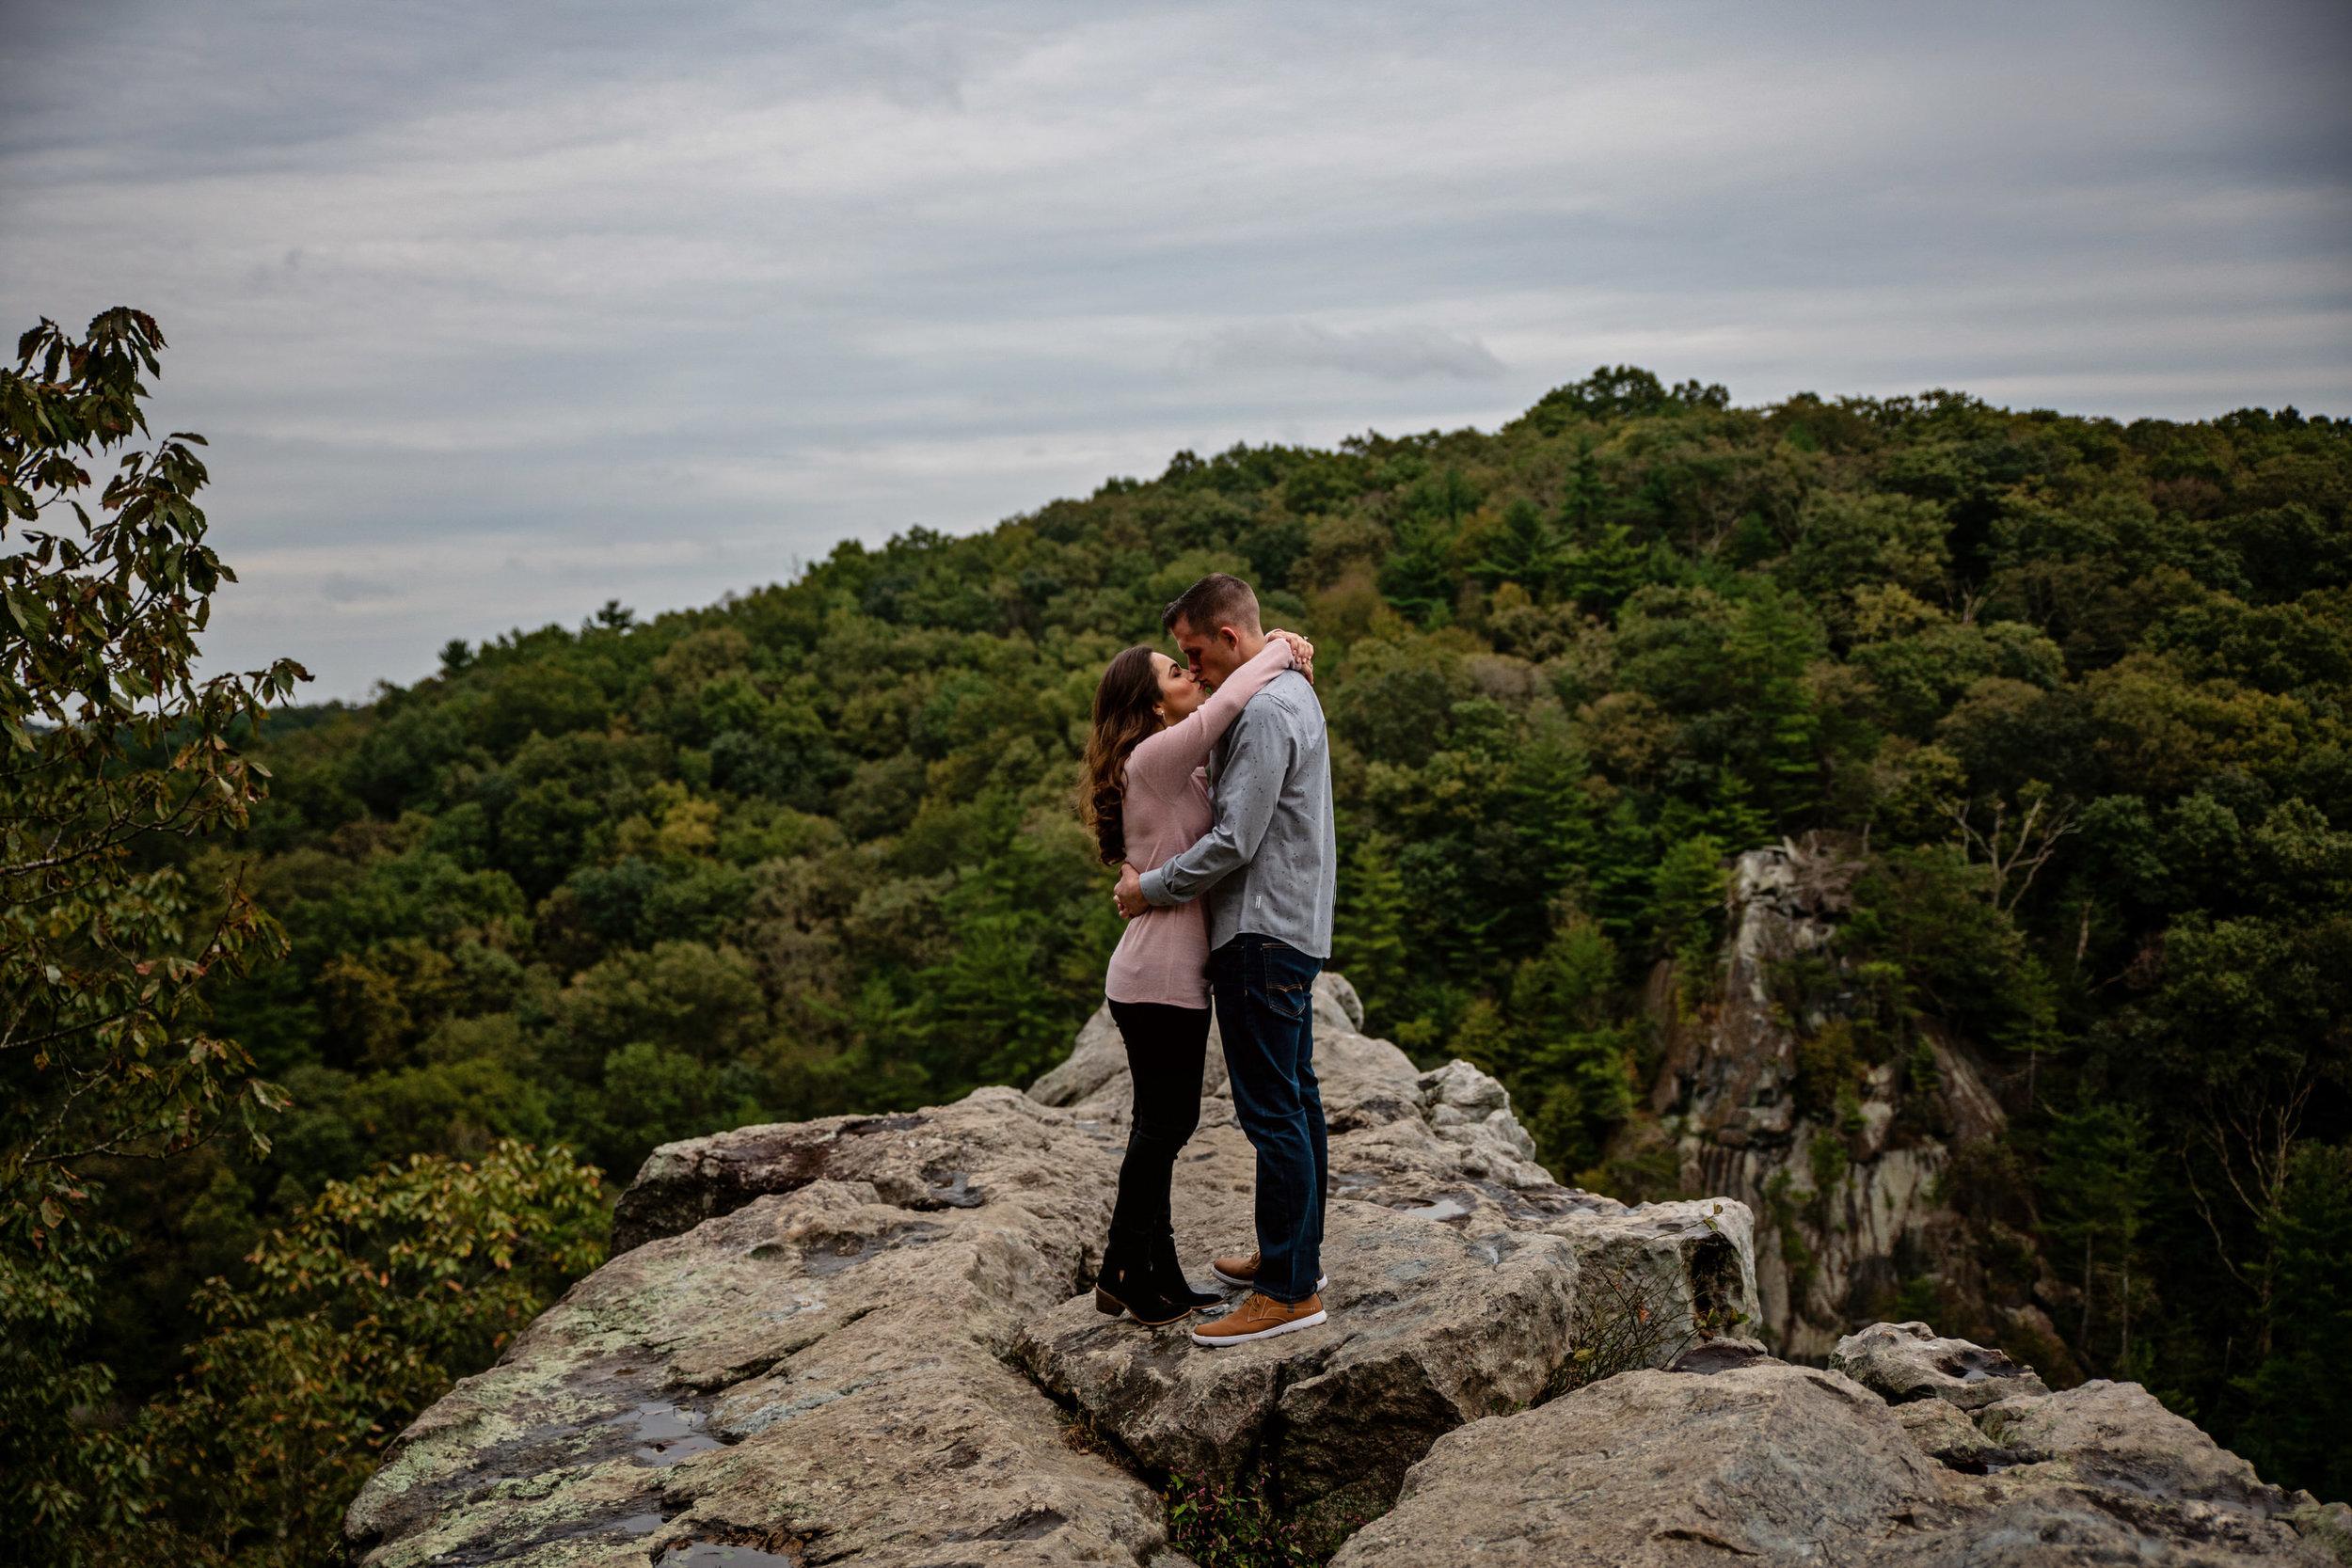 MarylandAdventureEngagement-Brenda&Tony-24.jpg